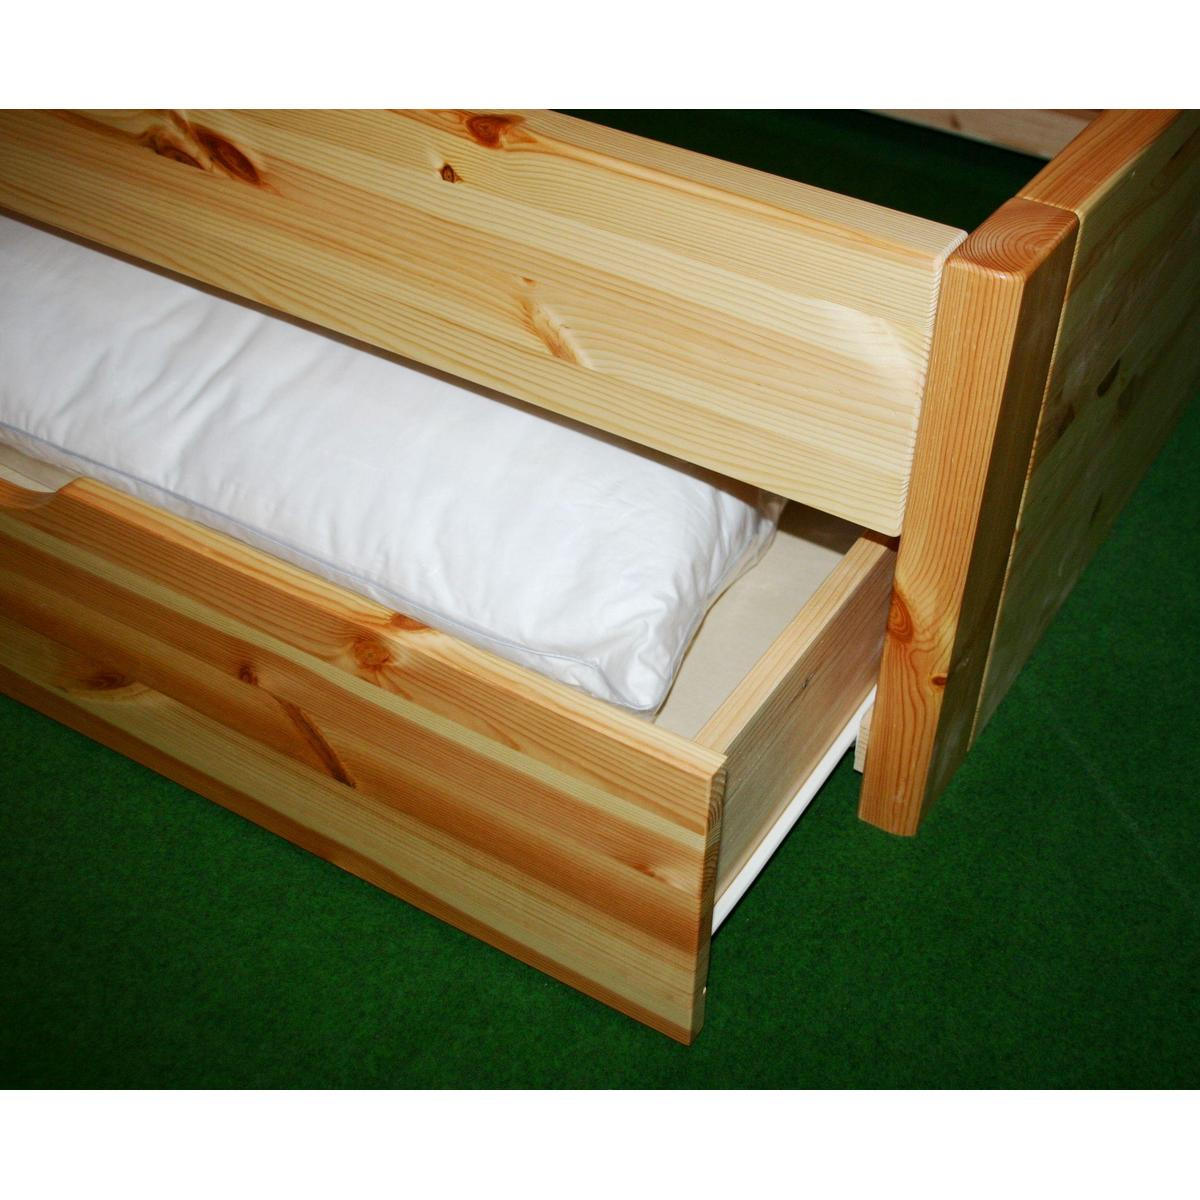 Funktionsbett 160x200  Holzbett Bett mit Schubladen weiss lasiert 160x200 holz Kiefer massiv